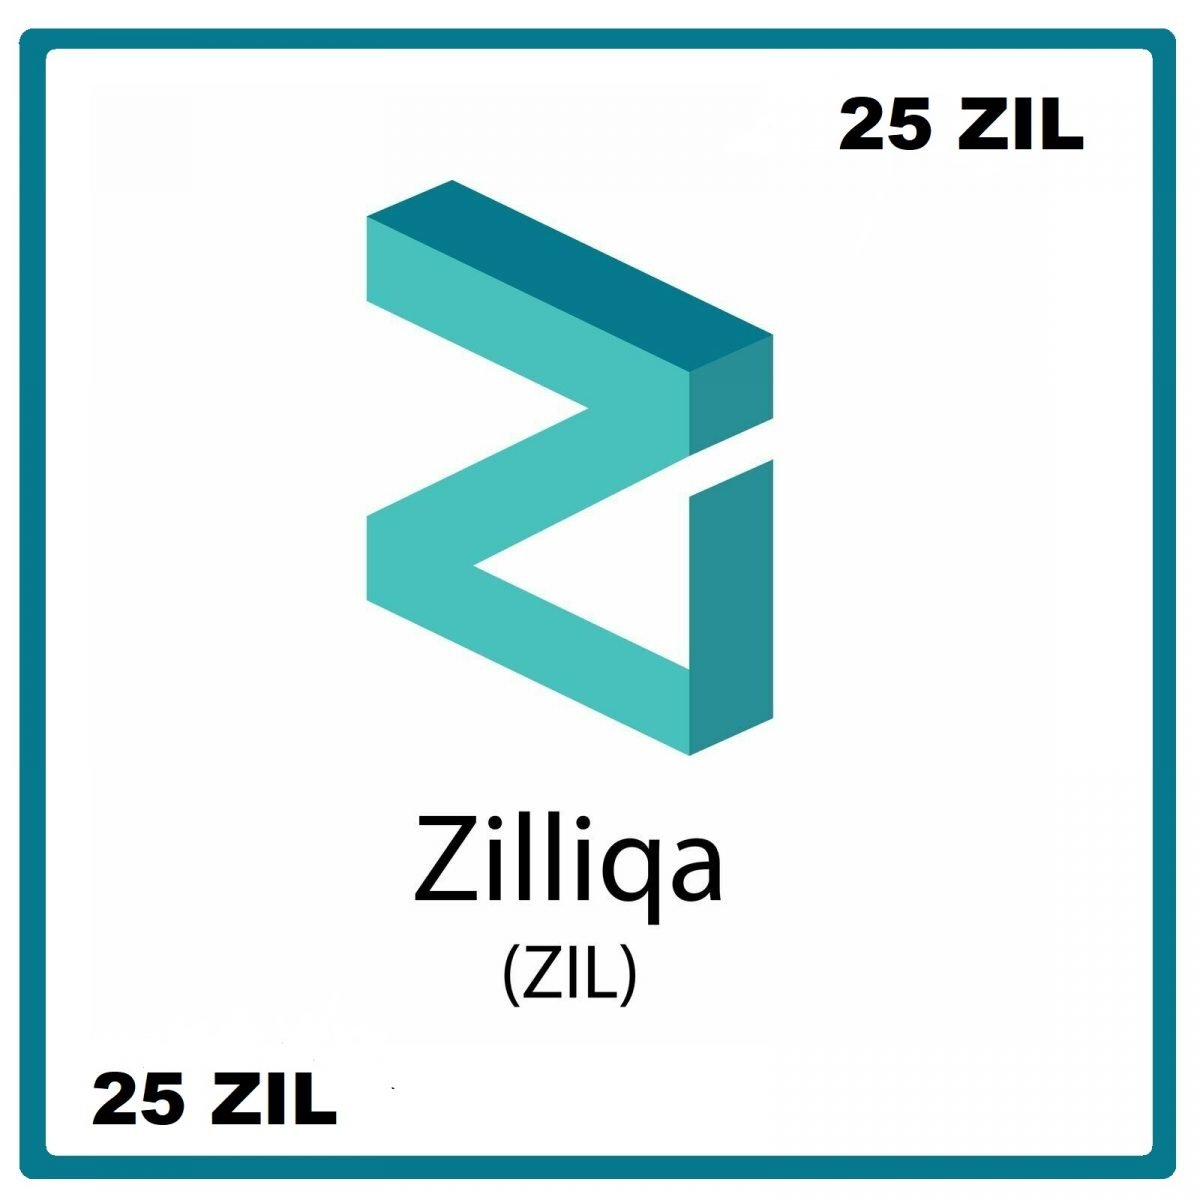 25 Zilliqa Mining Contract